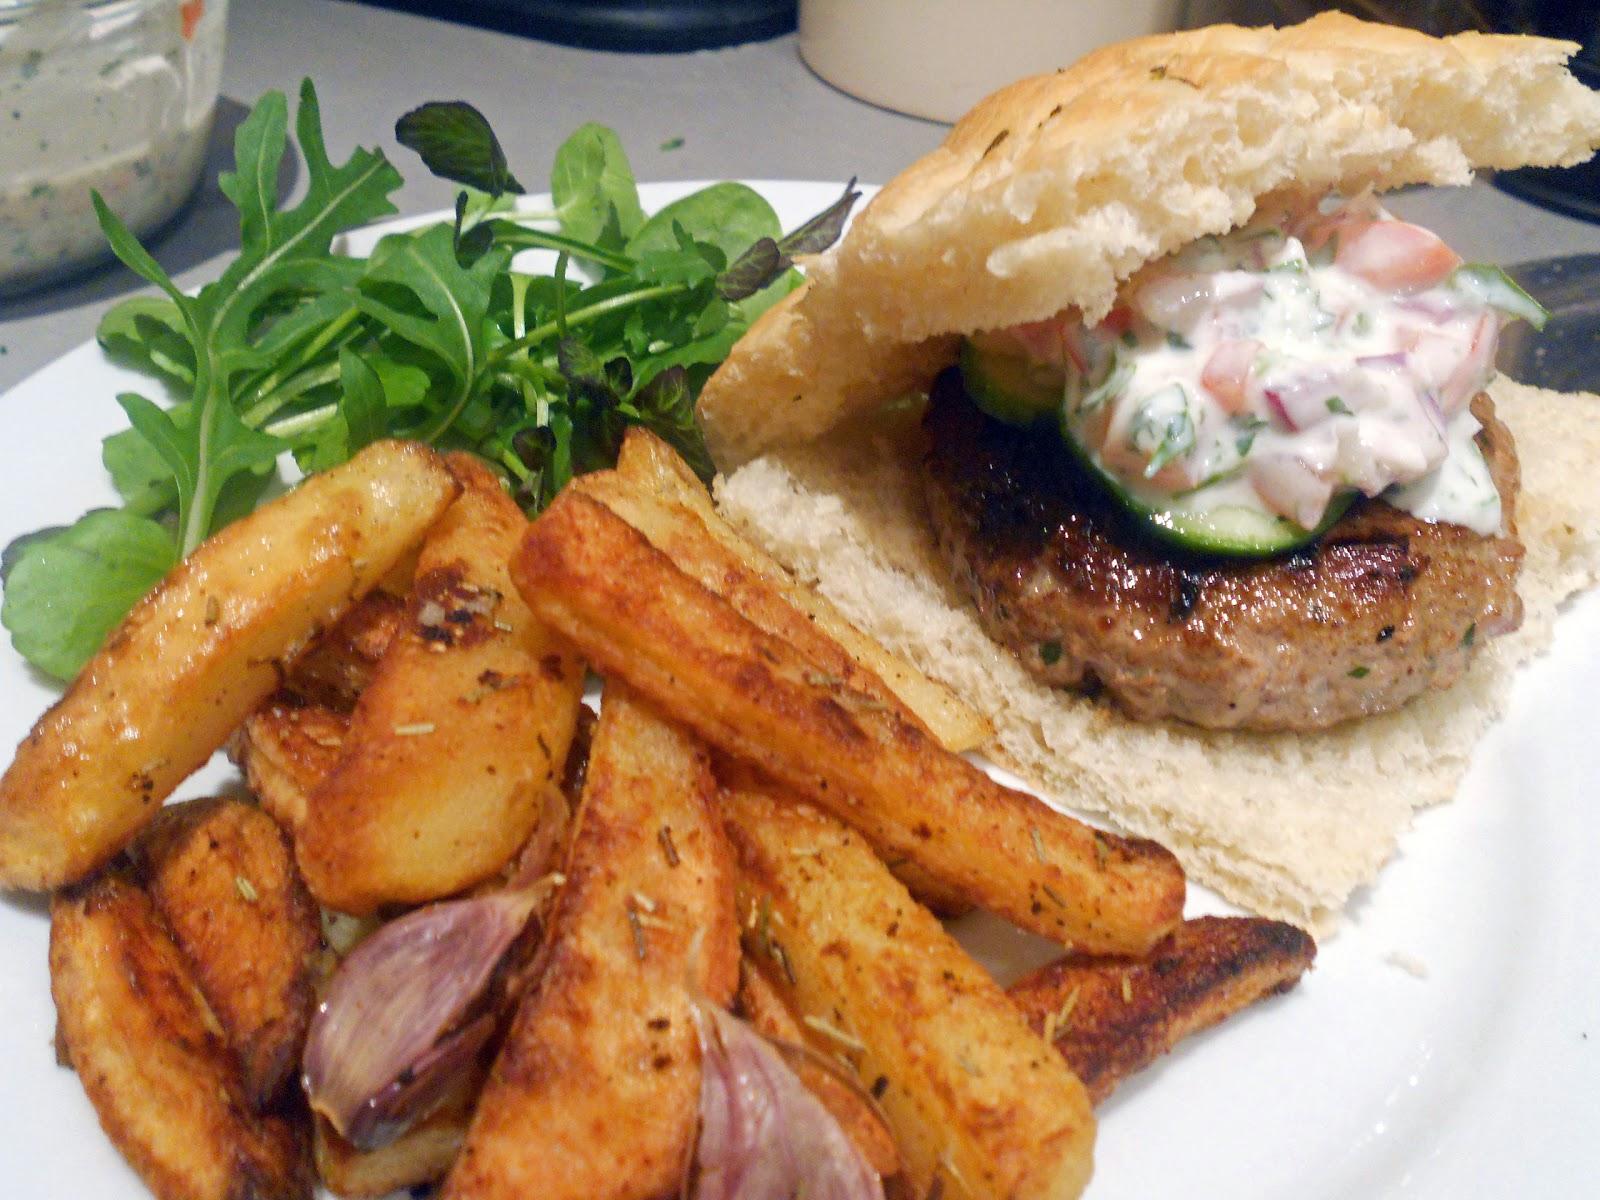 Fatboy's Kitchen: Minted Lamb Burgers